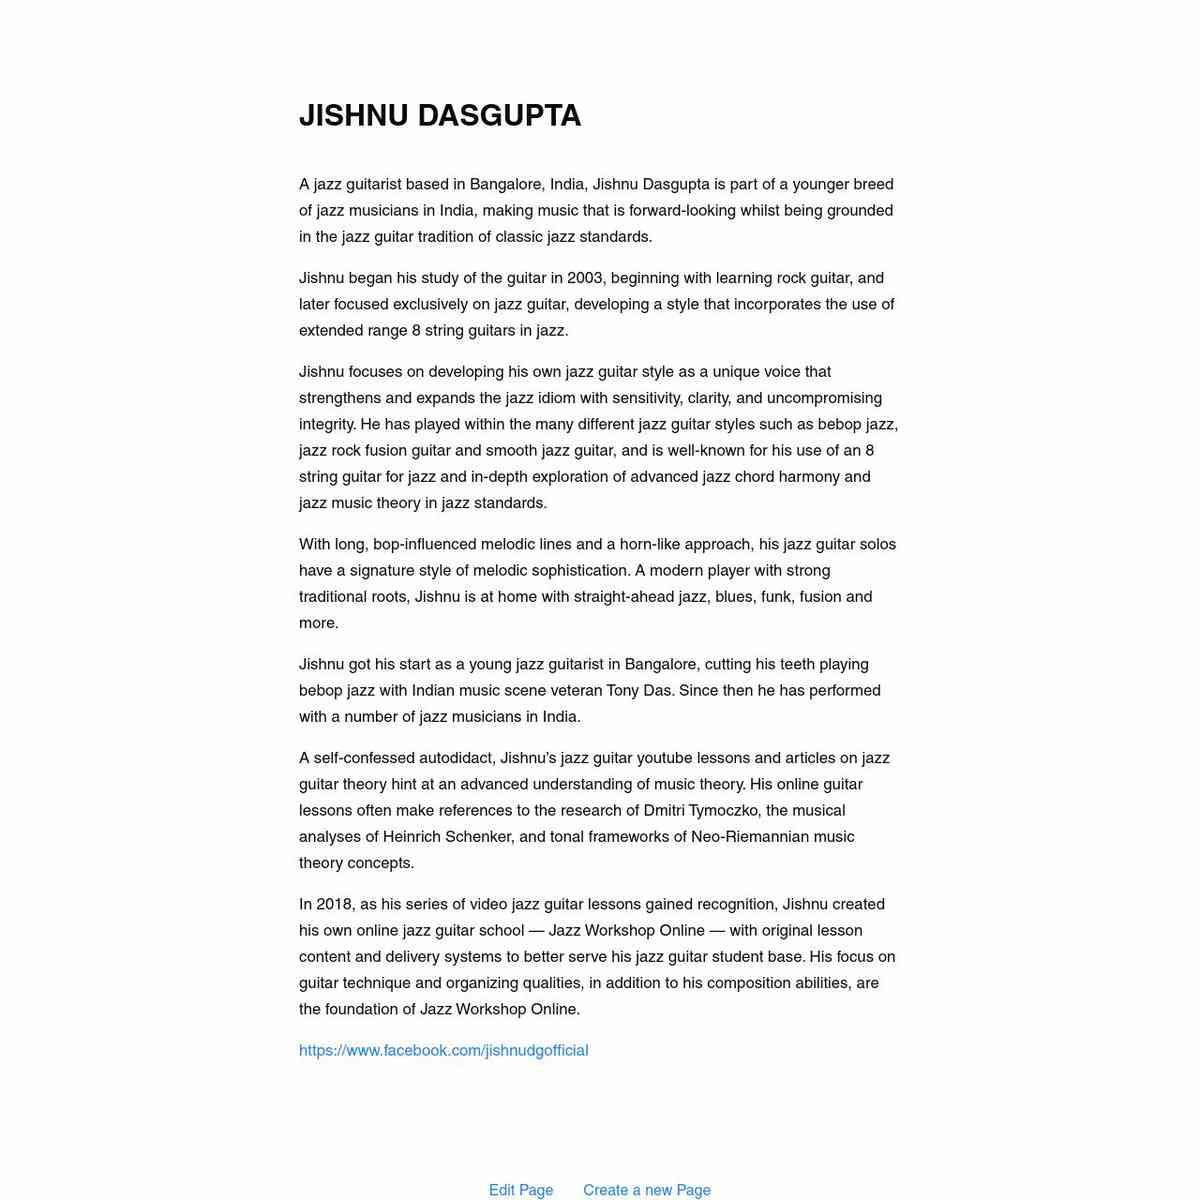 http://jishnu-dasgupta.pen.io/